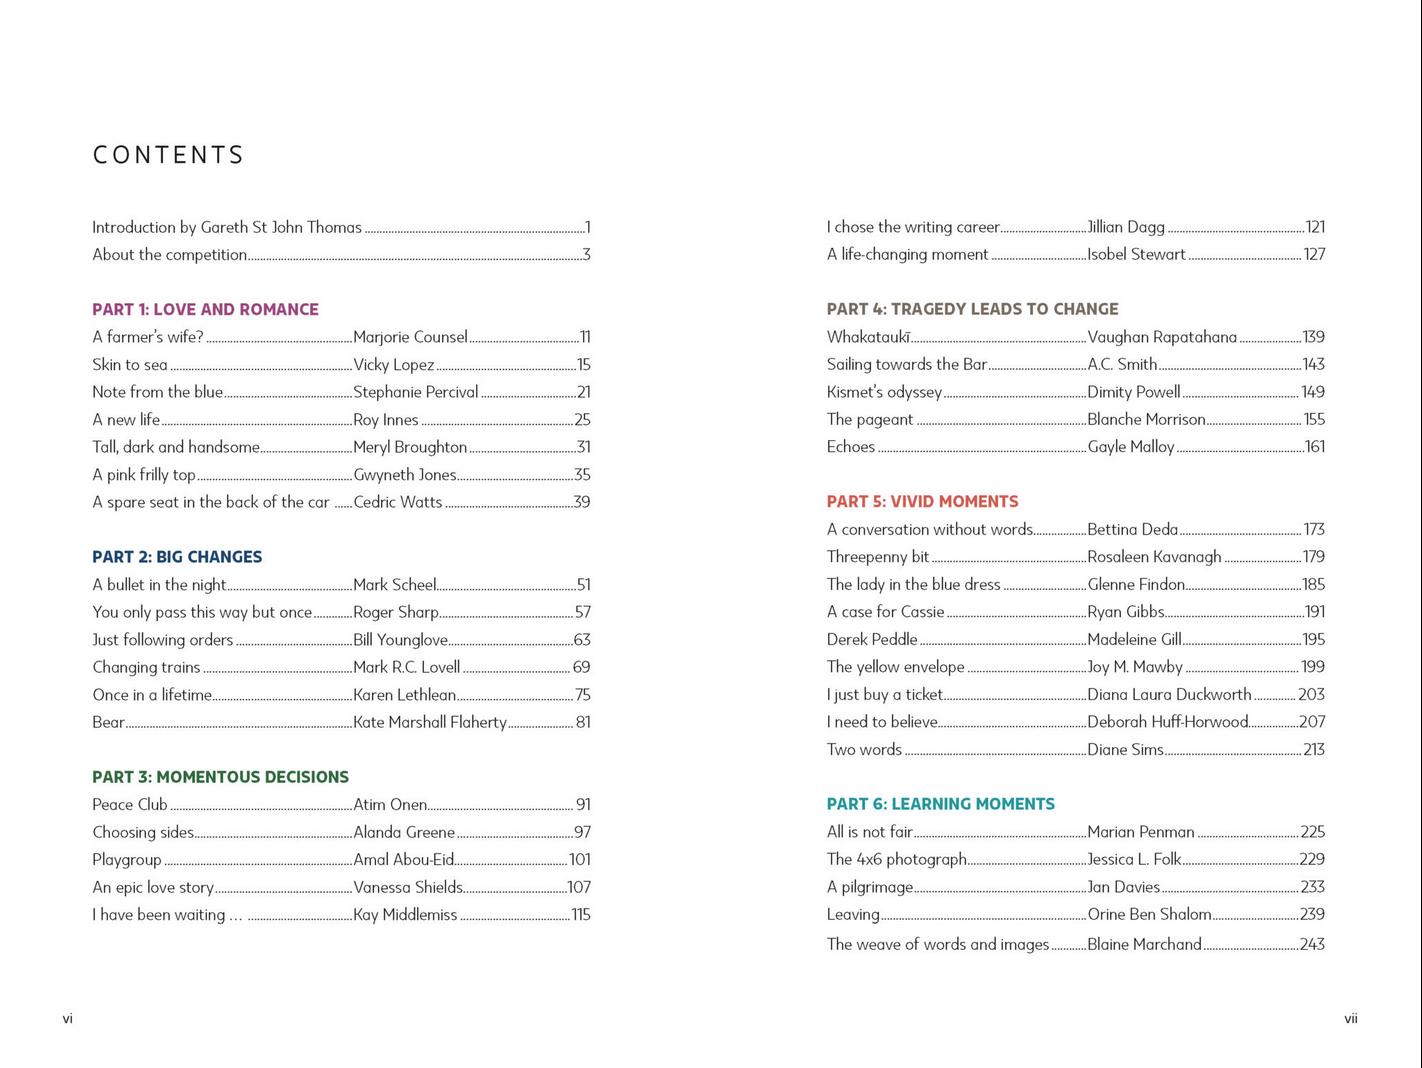 The Turning Point Contents, anthology, memoir, Bettina Deda writer